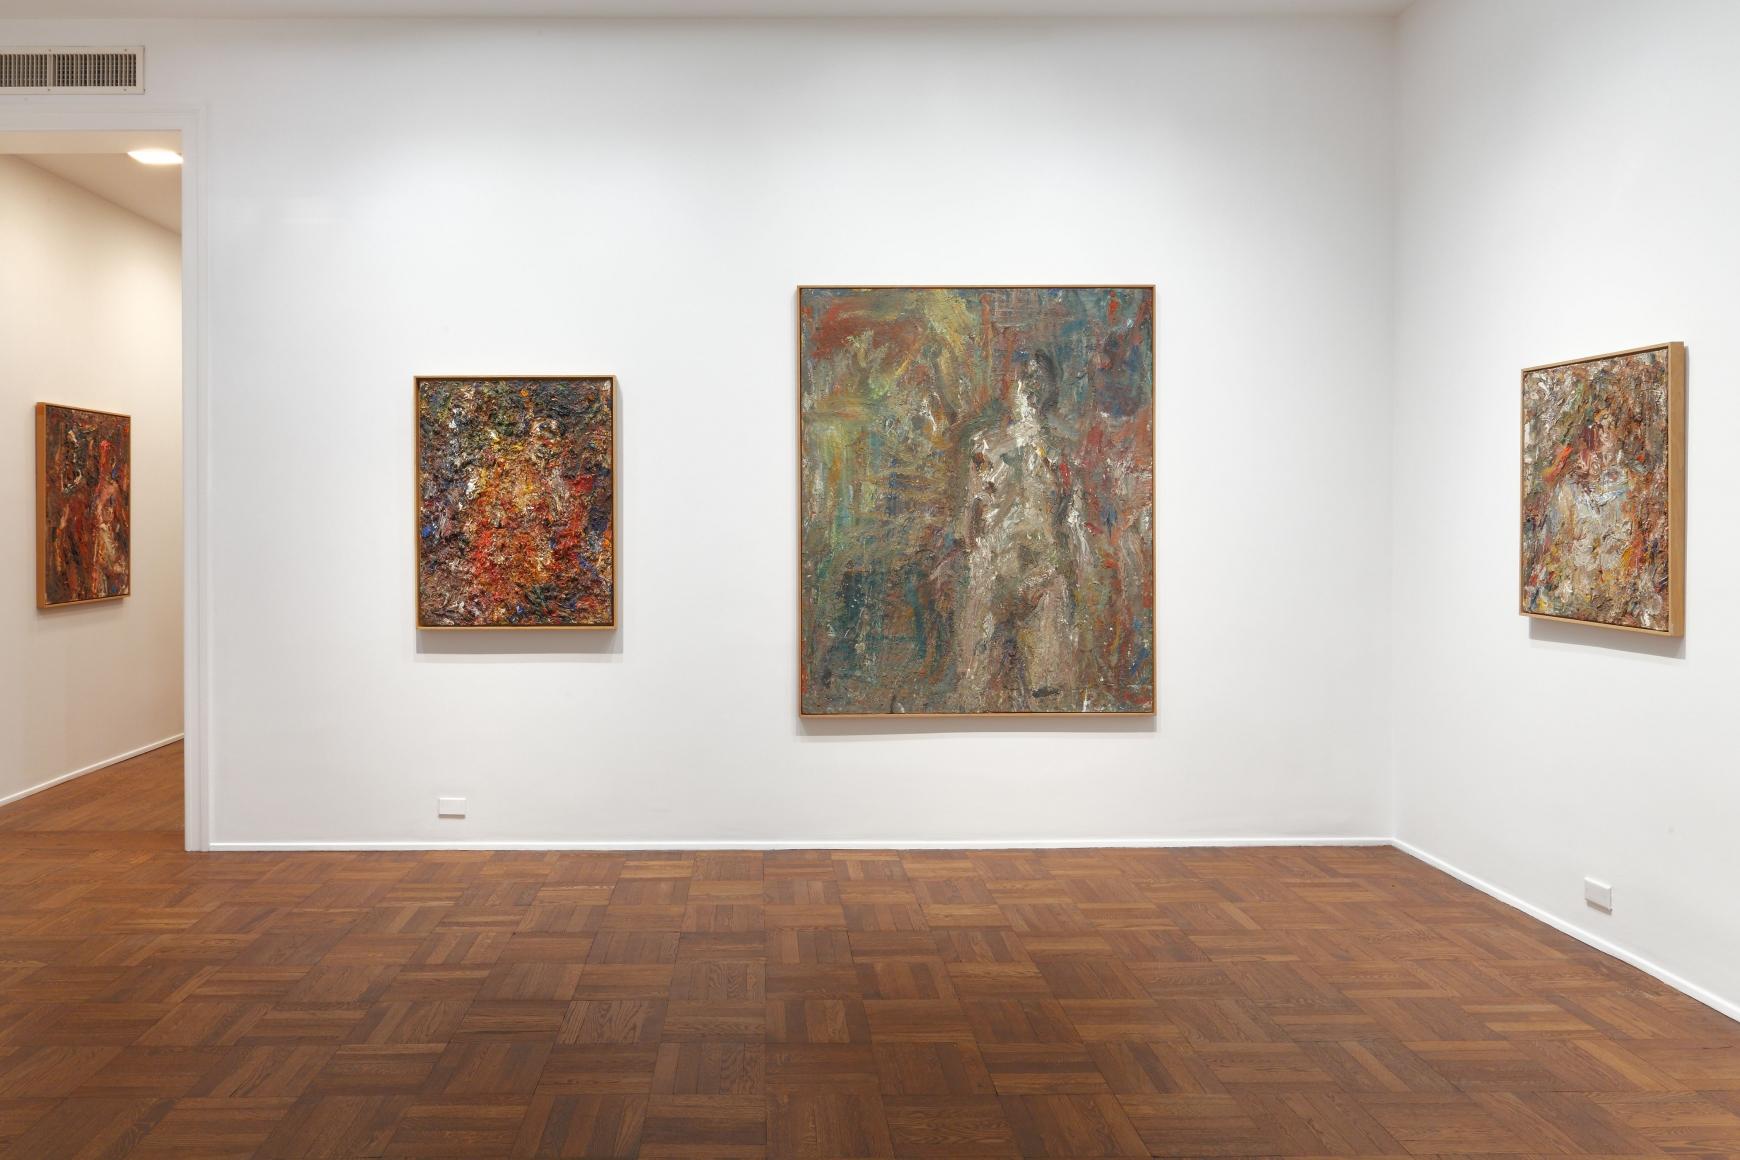 EUGÈNE LEROY, Nudes, New York, 2012, Installation Image 2